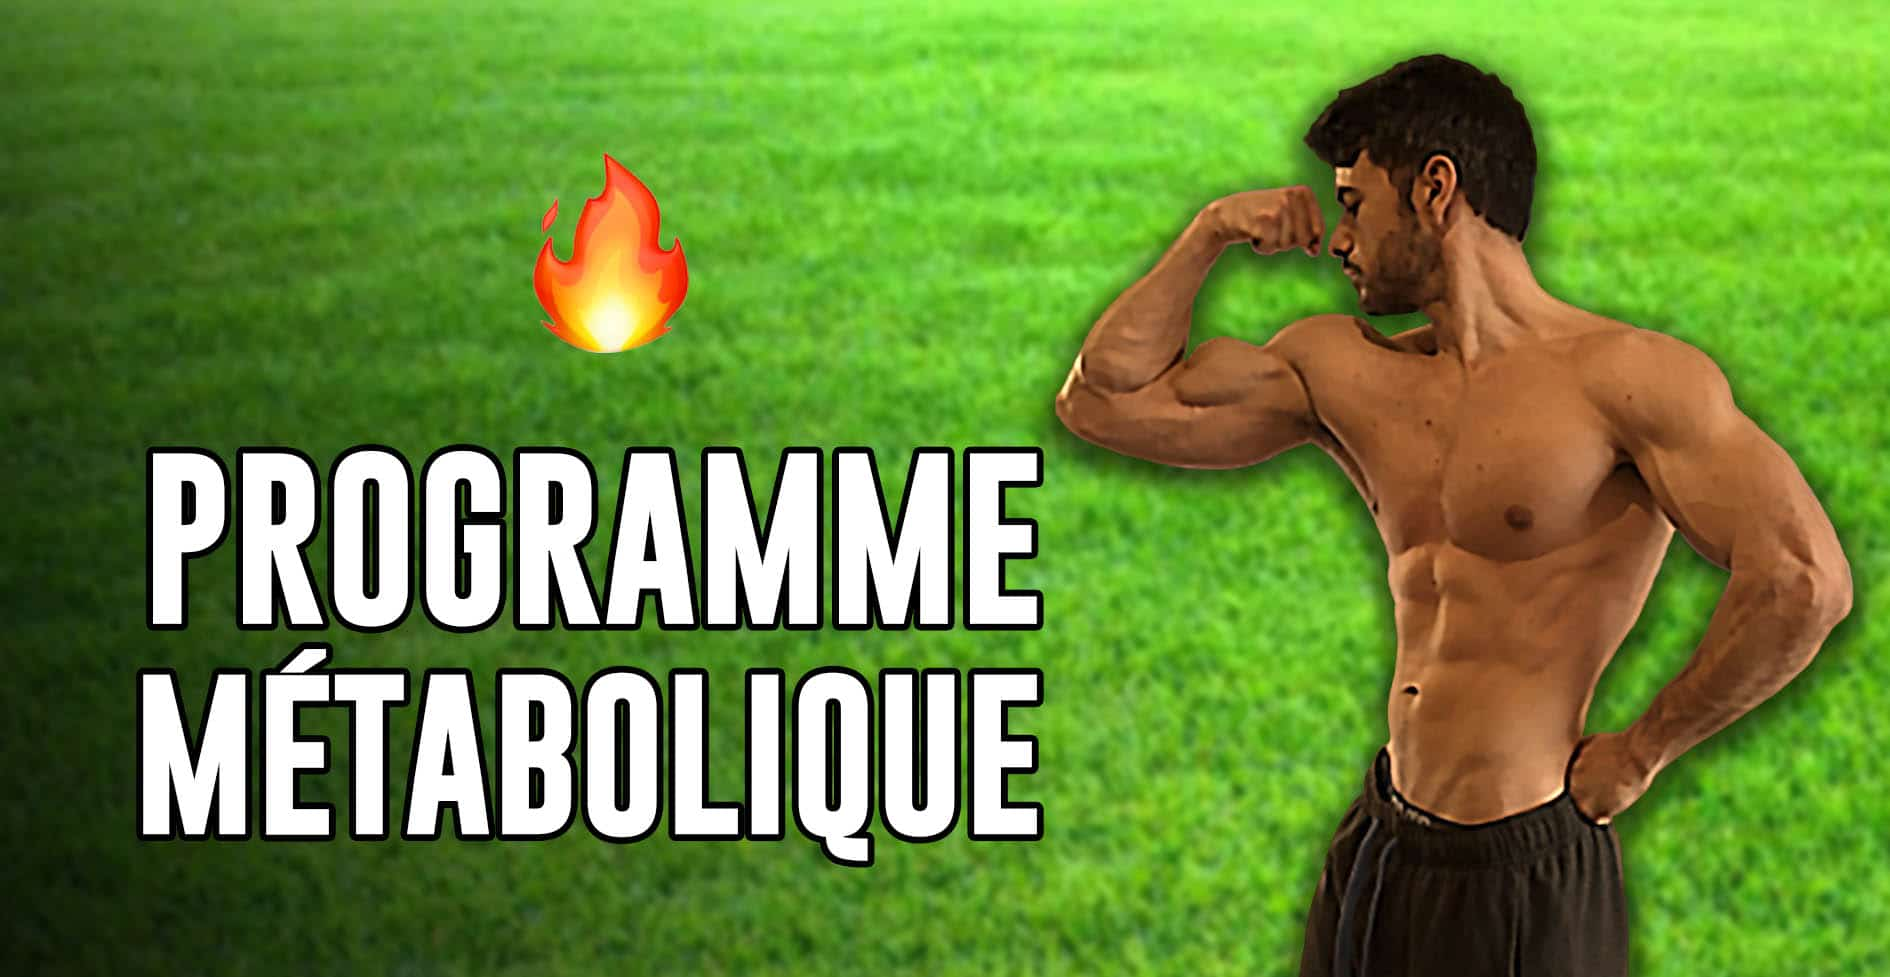 programme métabolique musculation